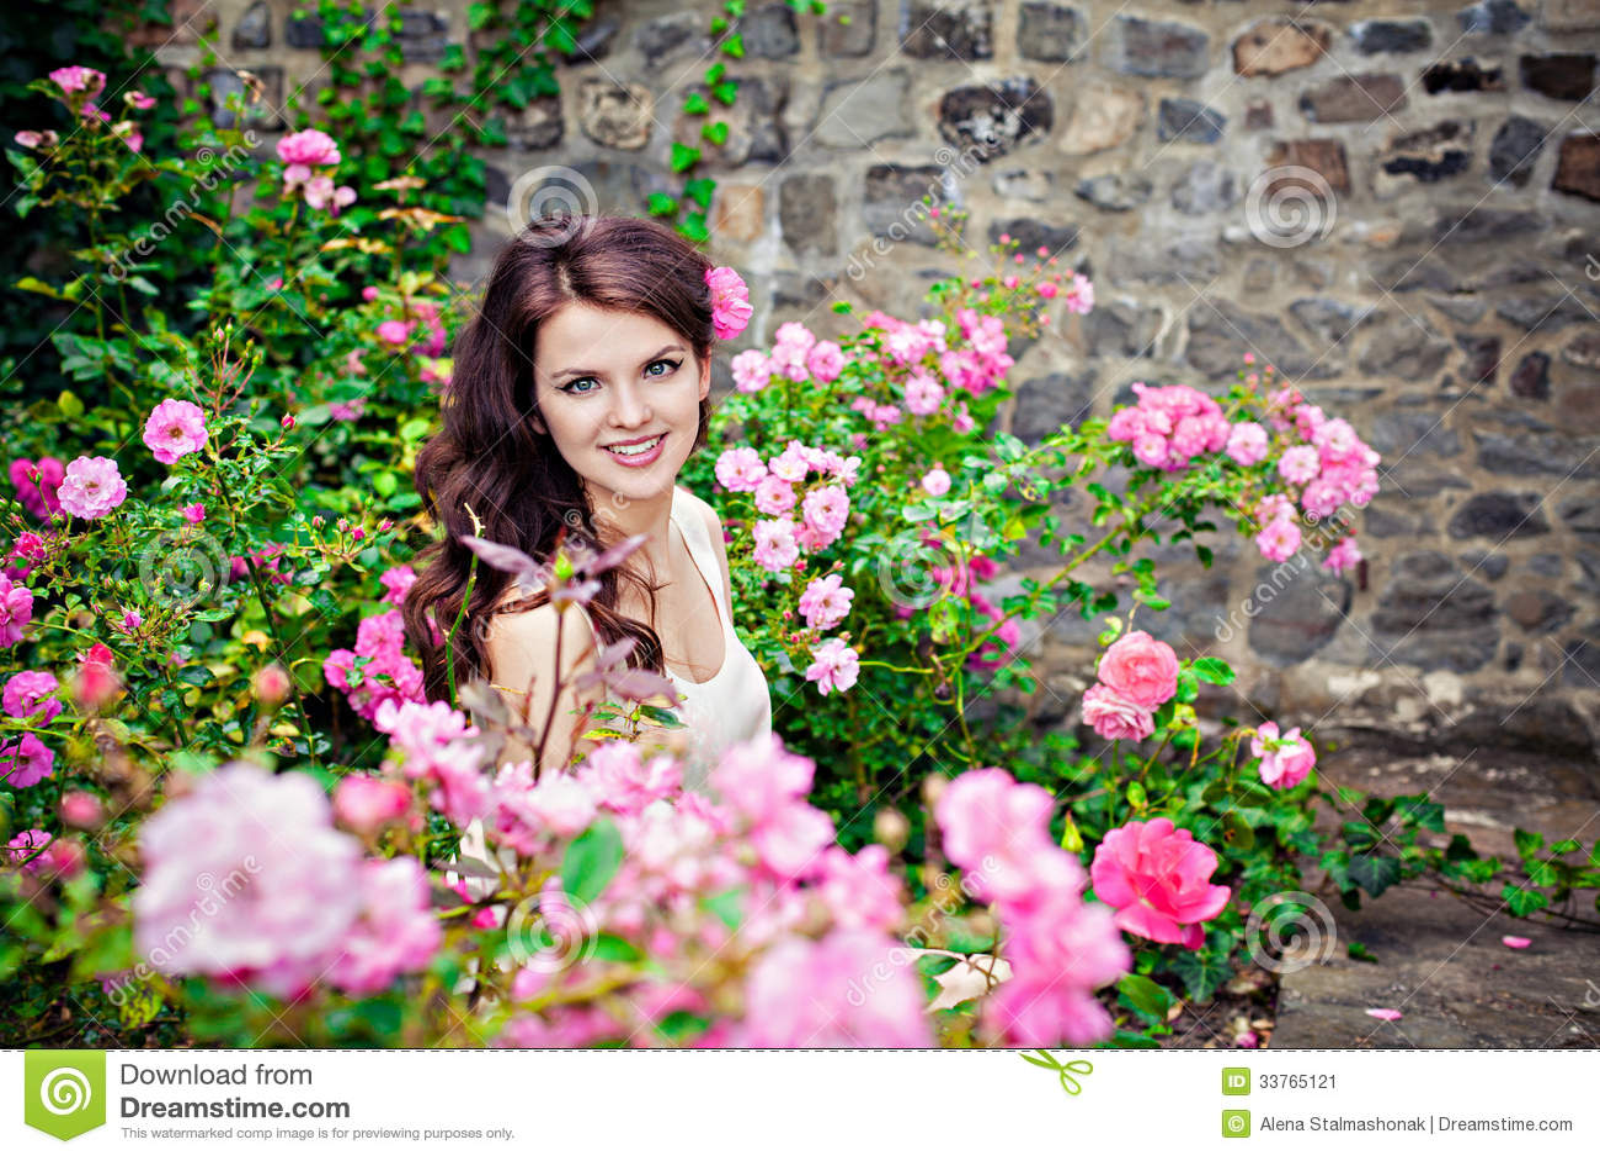 bb6d4525f Mujer En Un Jardín De Rosas Imagen de archivo - Imagen de outdoors ...